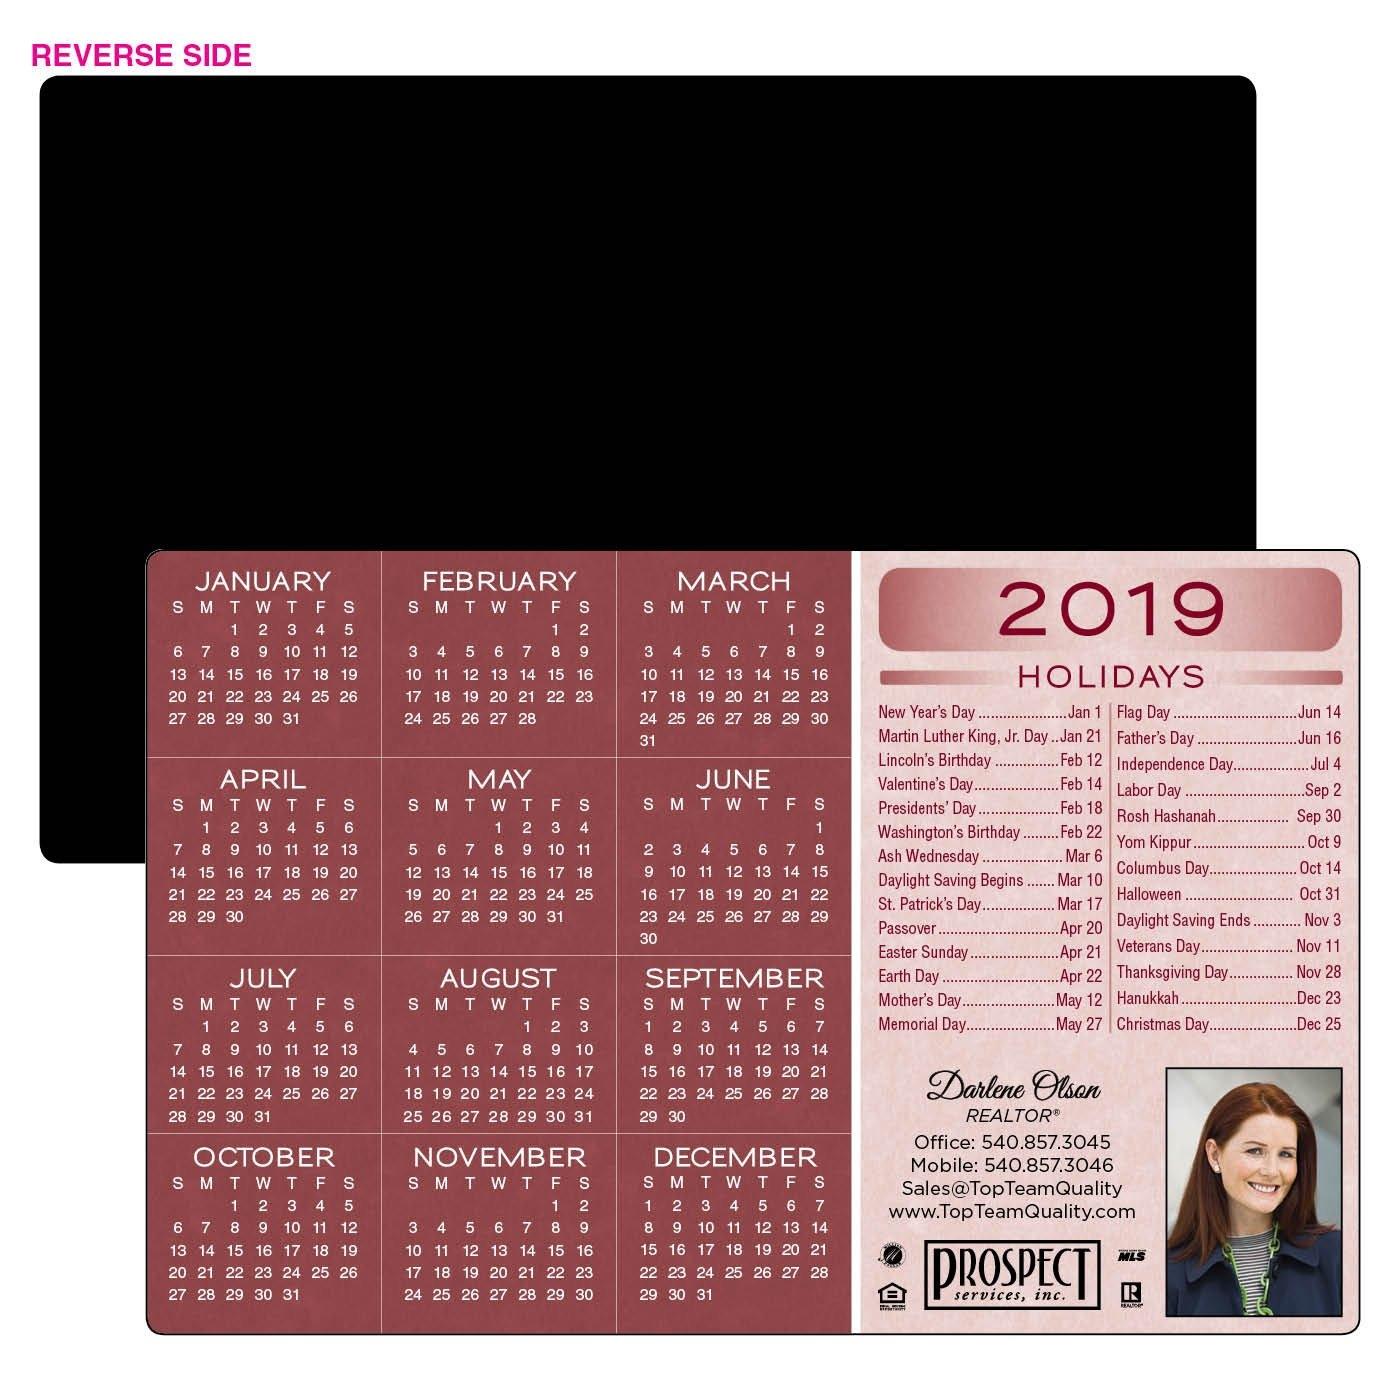 Jumbo Calendar Magnet | 5585 | Holiday List Calendar 2019 Magnet